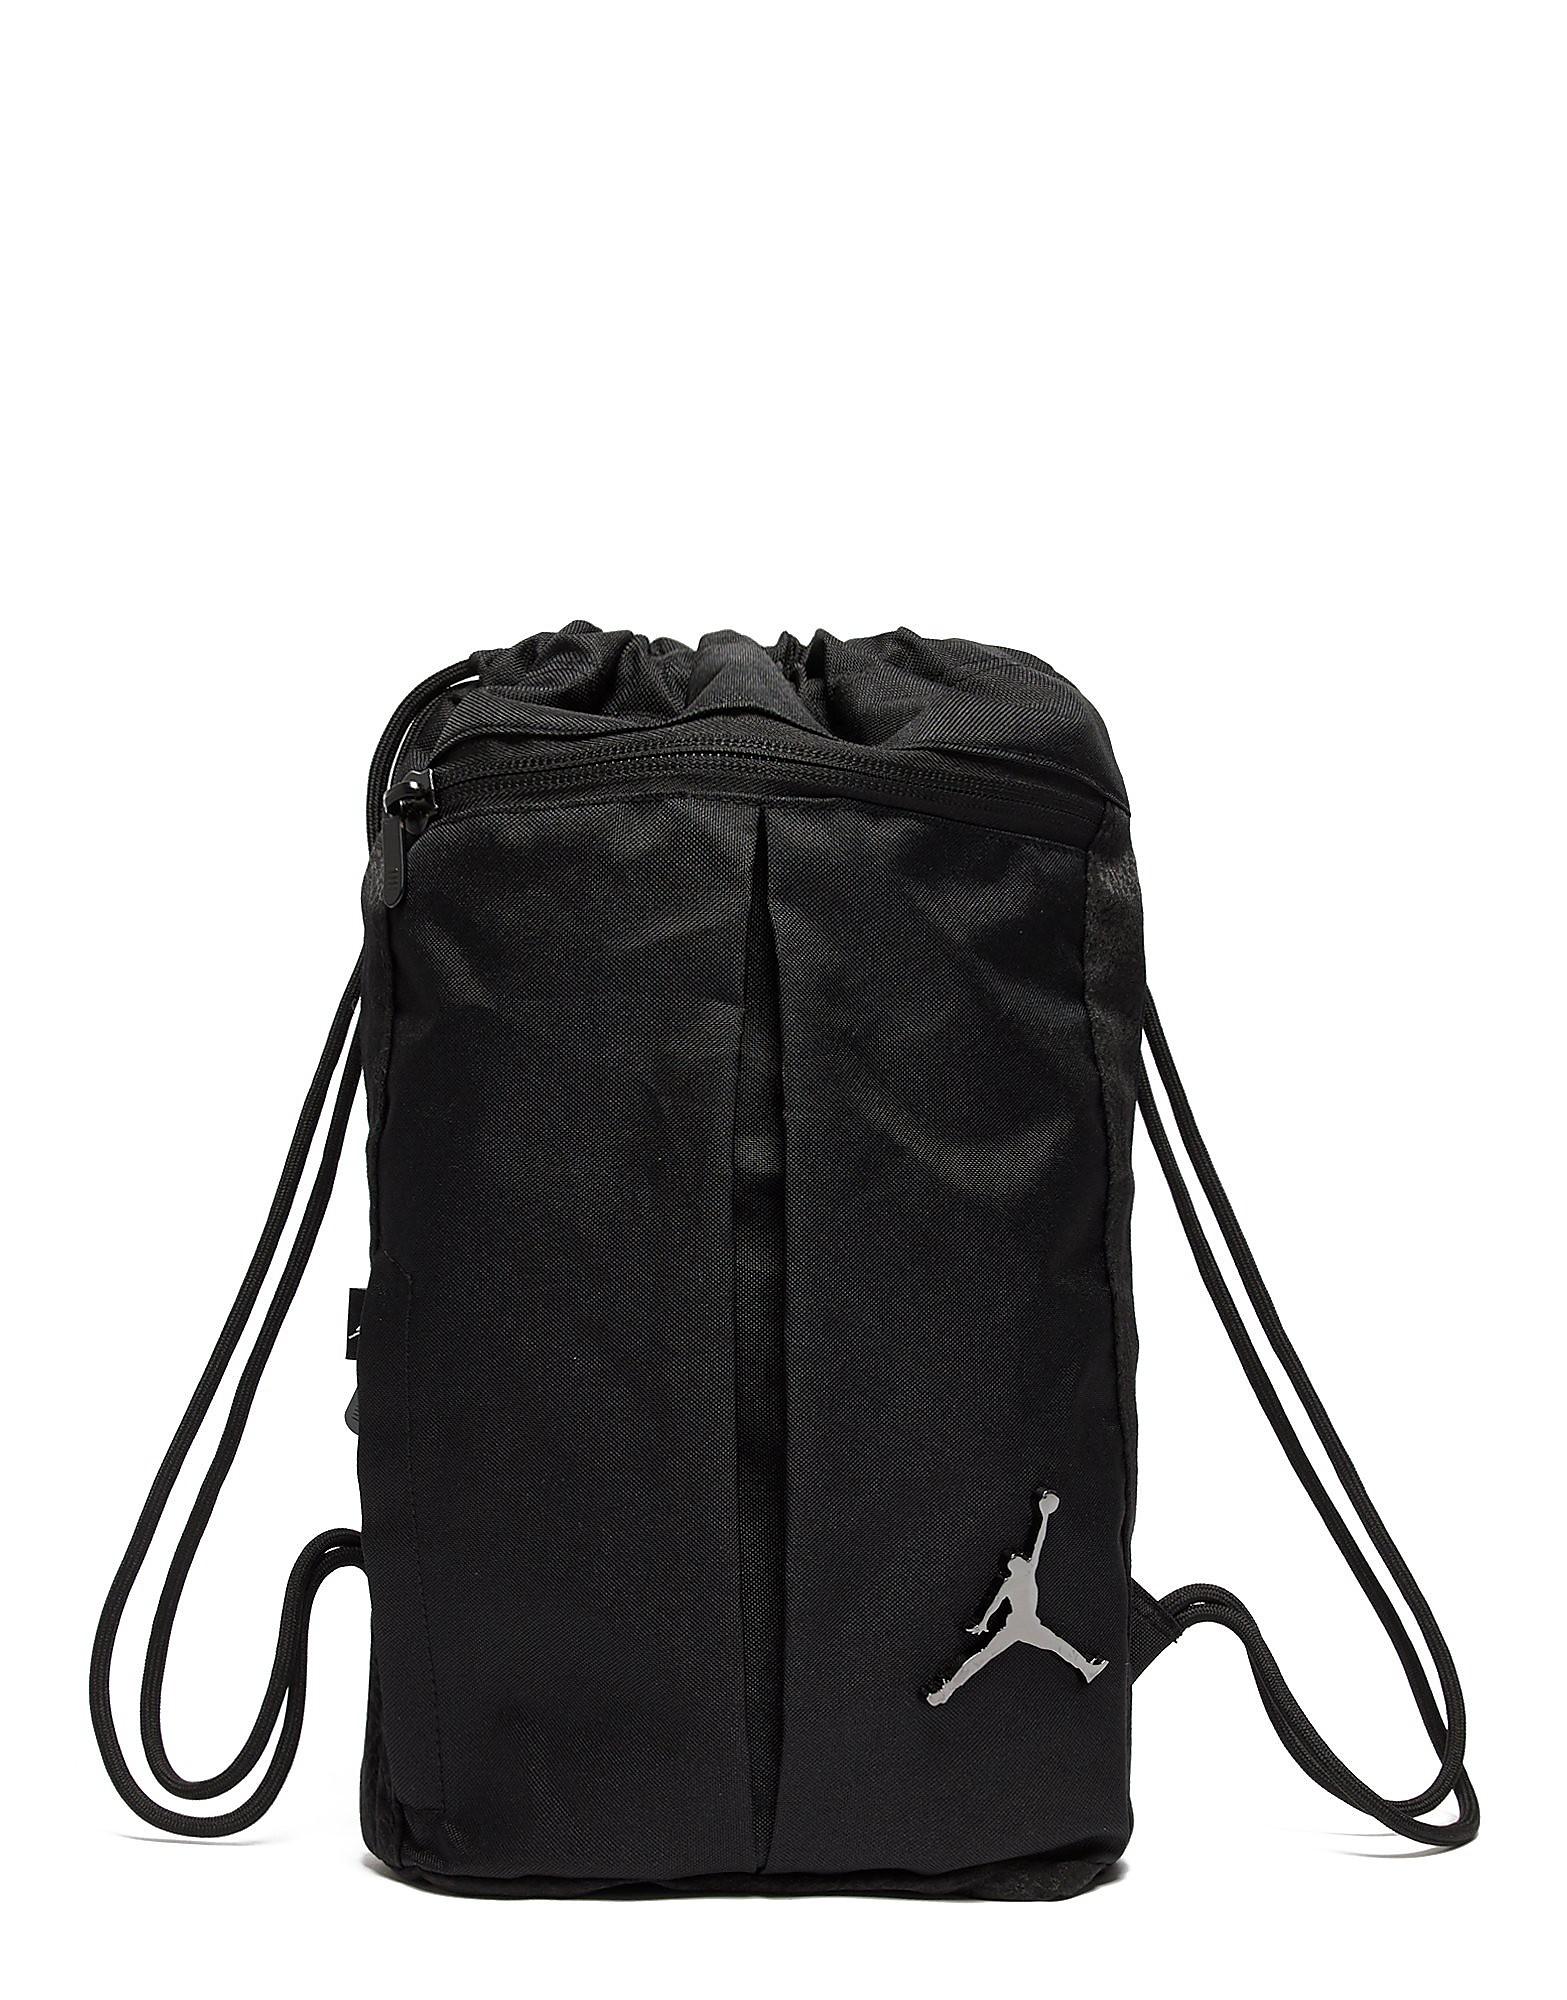 Jordan Unconscious Backpack